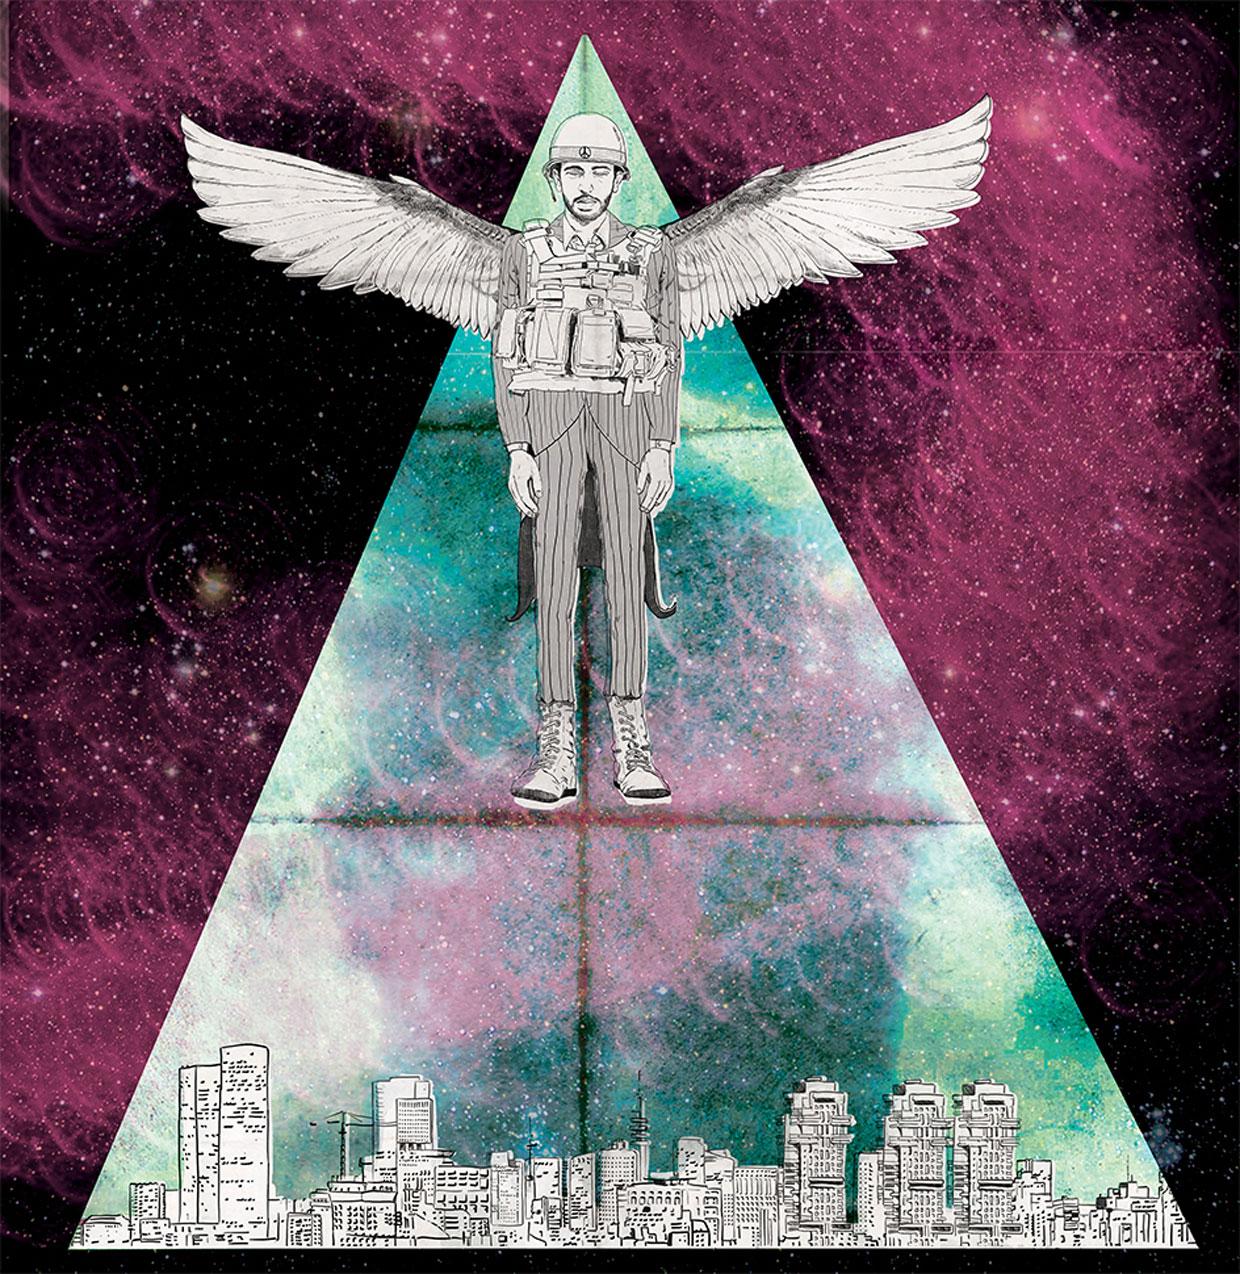 a-dream by Amit Shimoni